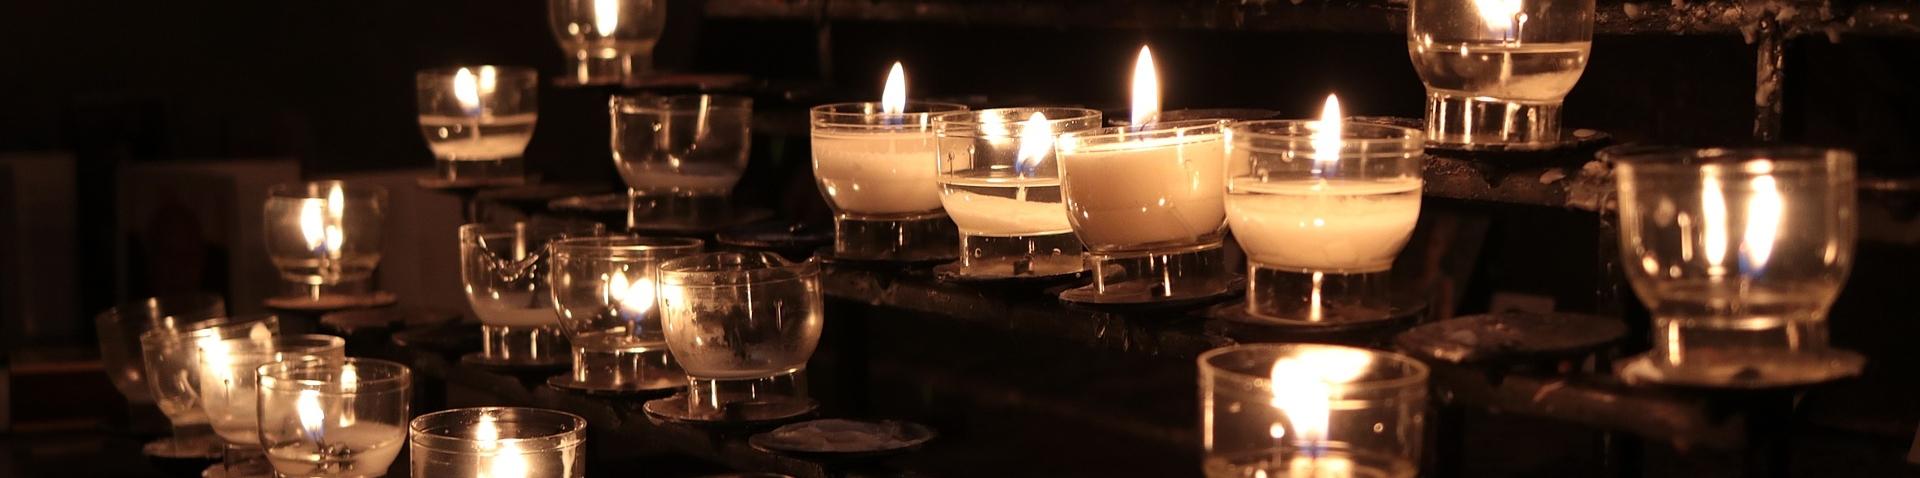 candles-2628575_1920.jpg